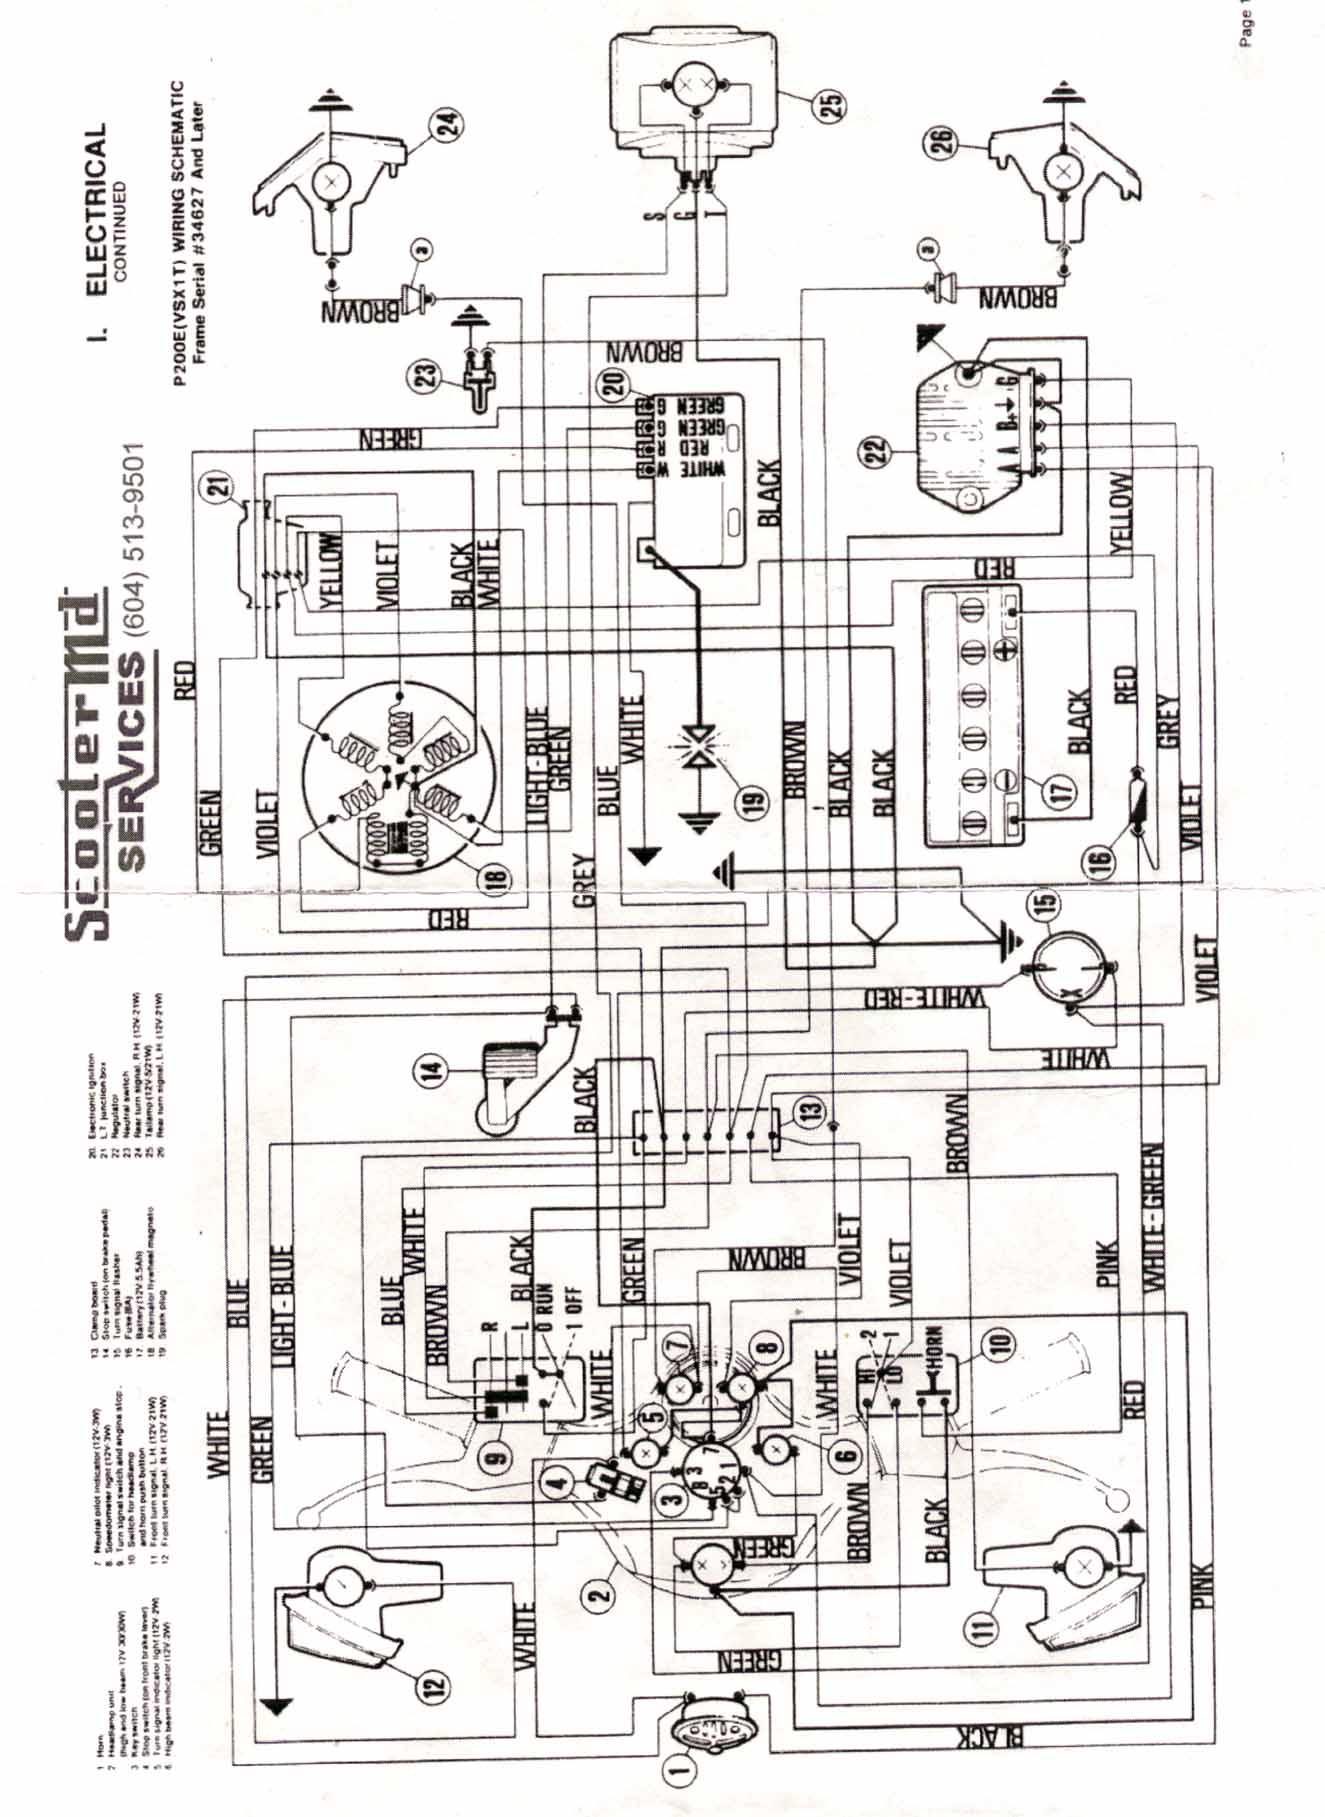 hight resolution of wiring diagram vespa p150x free wiring diagram for you u2022 vespa p200e wiring diagram get free image about wiring diagram